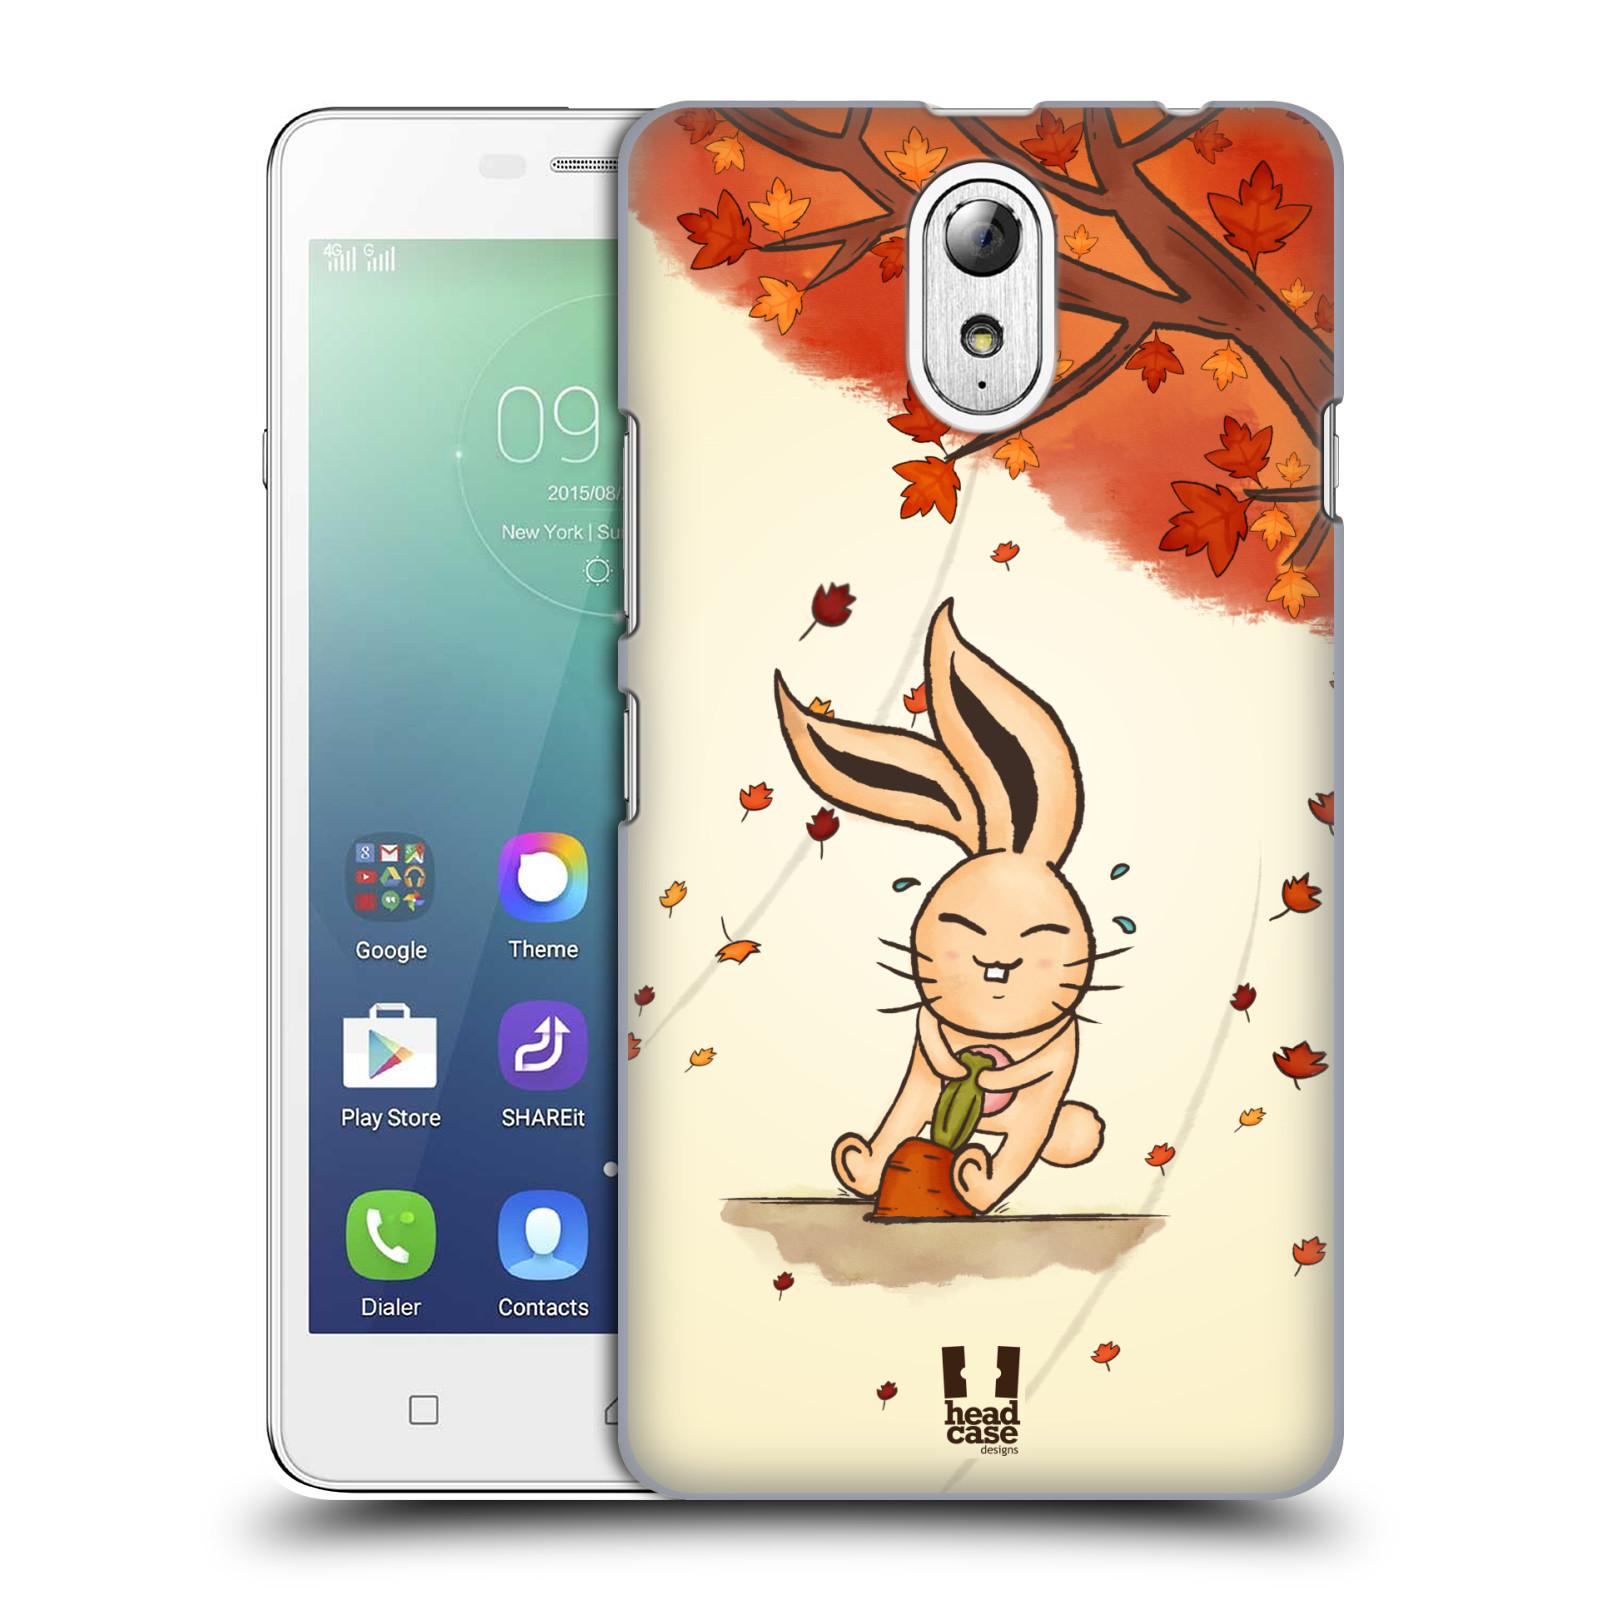 HEAD CASE pevný plastový obal na mobil LENOVO VIBE P1m / LENOVO VIBE p1m DUAL SIM vzor podzimní zvířátka zajíček a mrkev